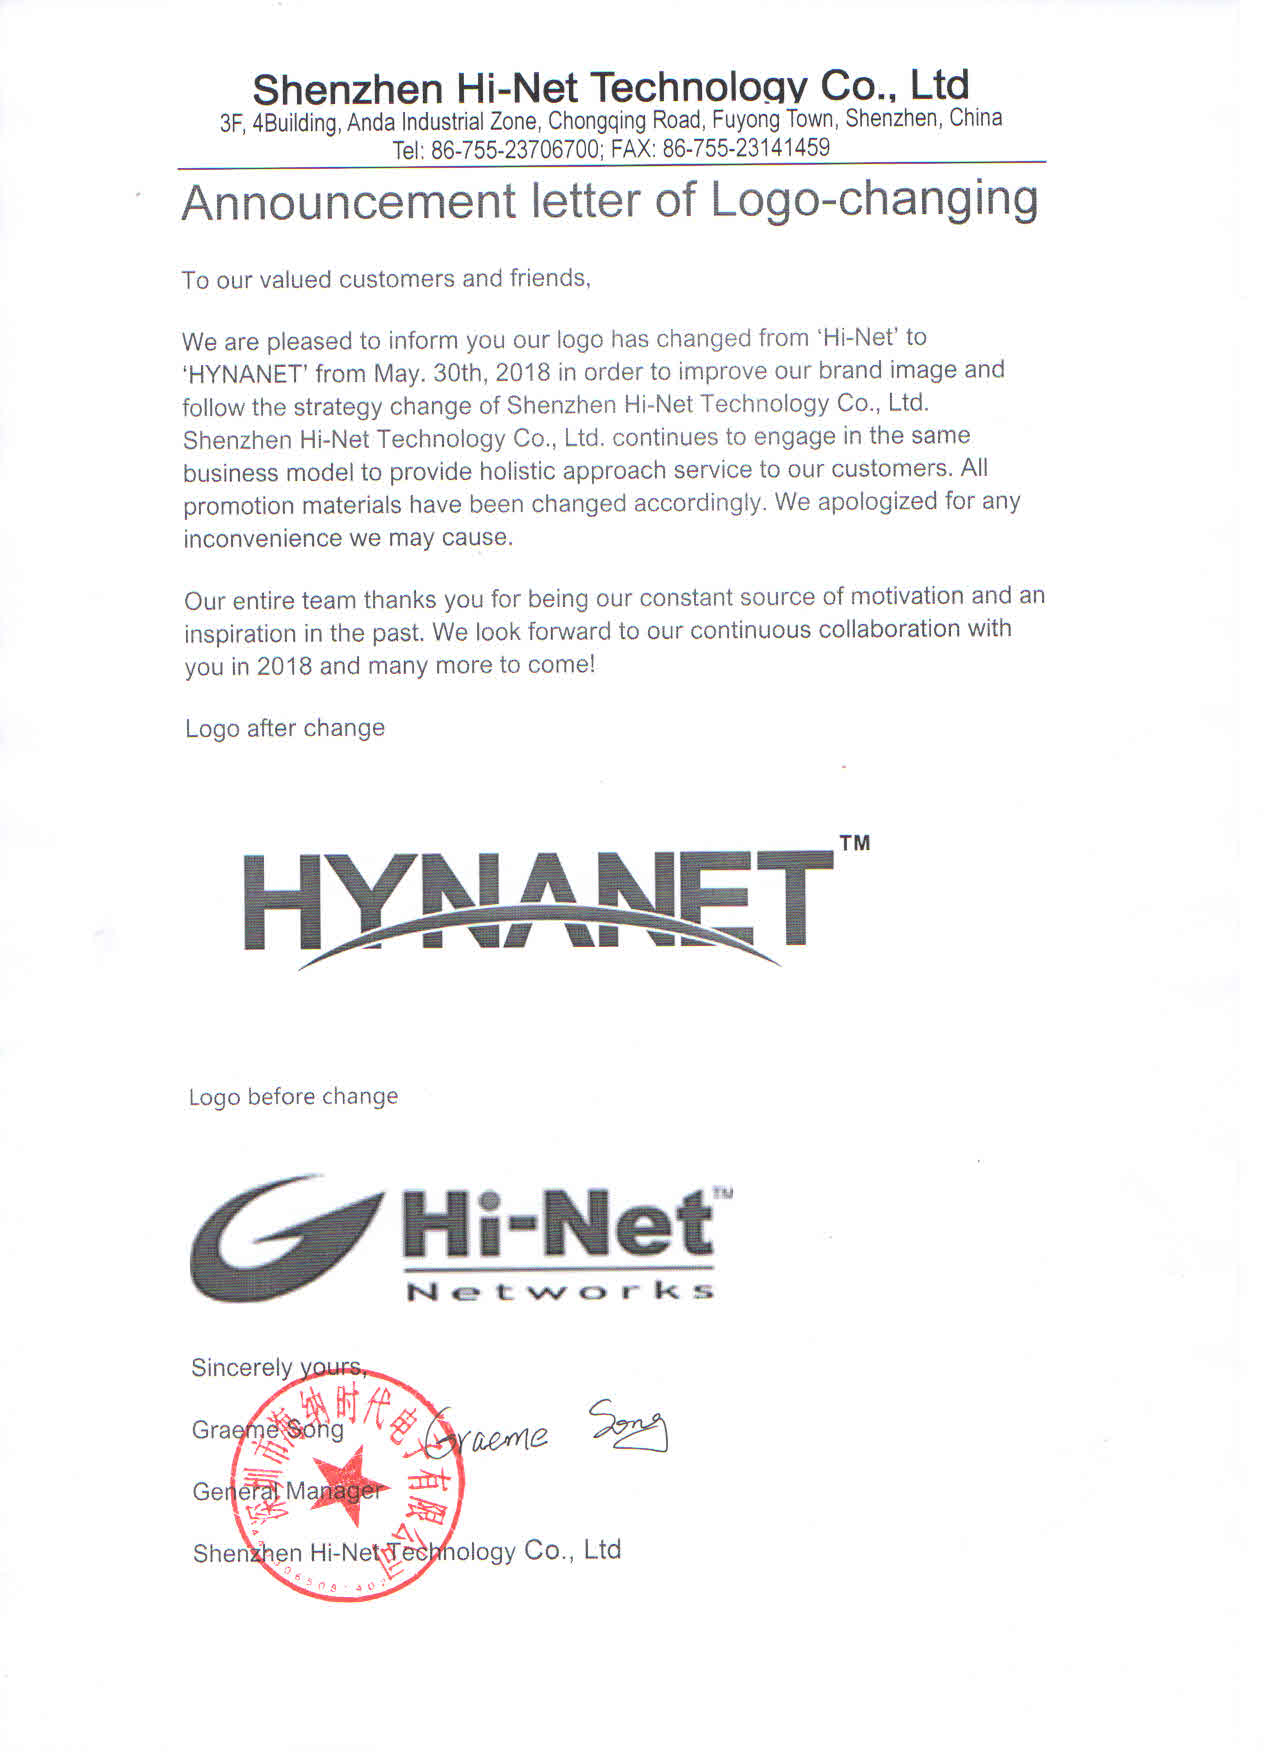 Hi-Net Brand Logo Change Announcement